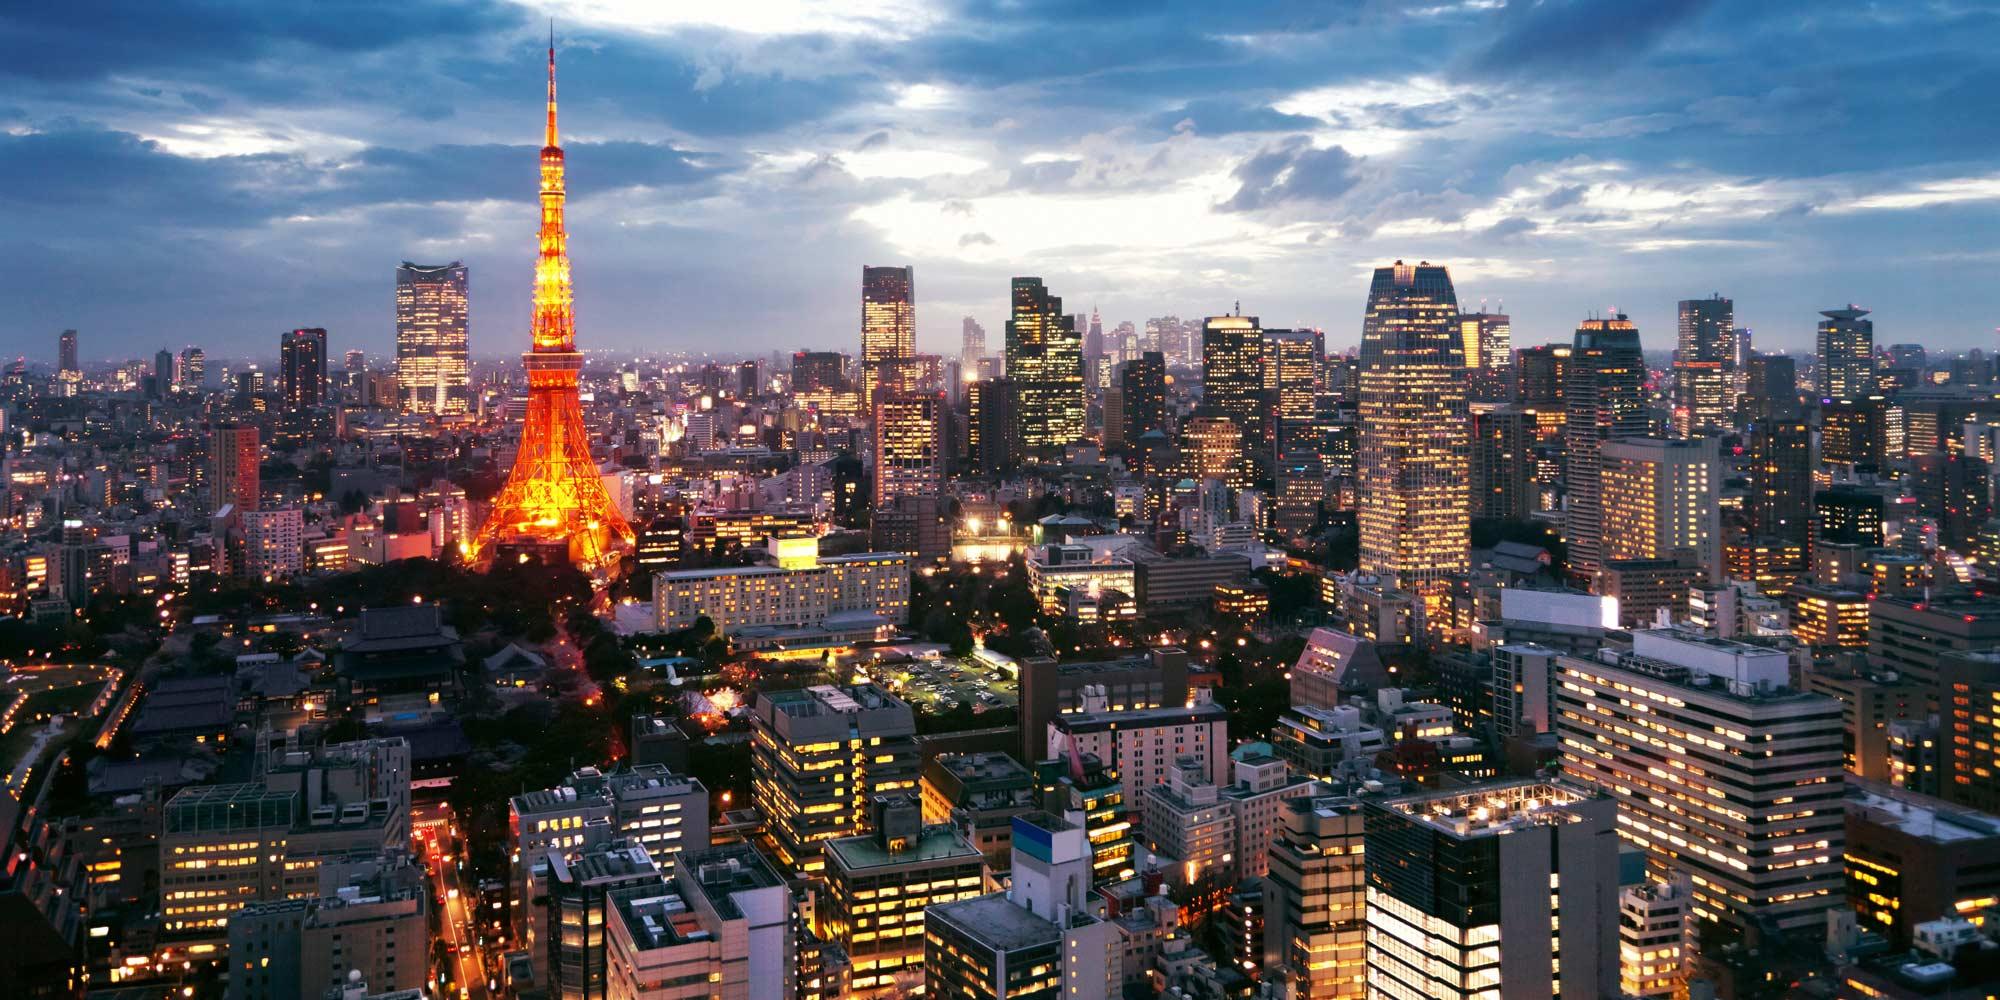 [Pré-TR] Tokyo du 28 mai/6 juin 2016 : Tokyo disneyland /ou disney sea 1 journée ?  81